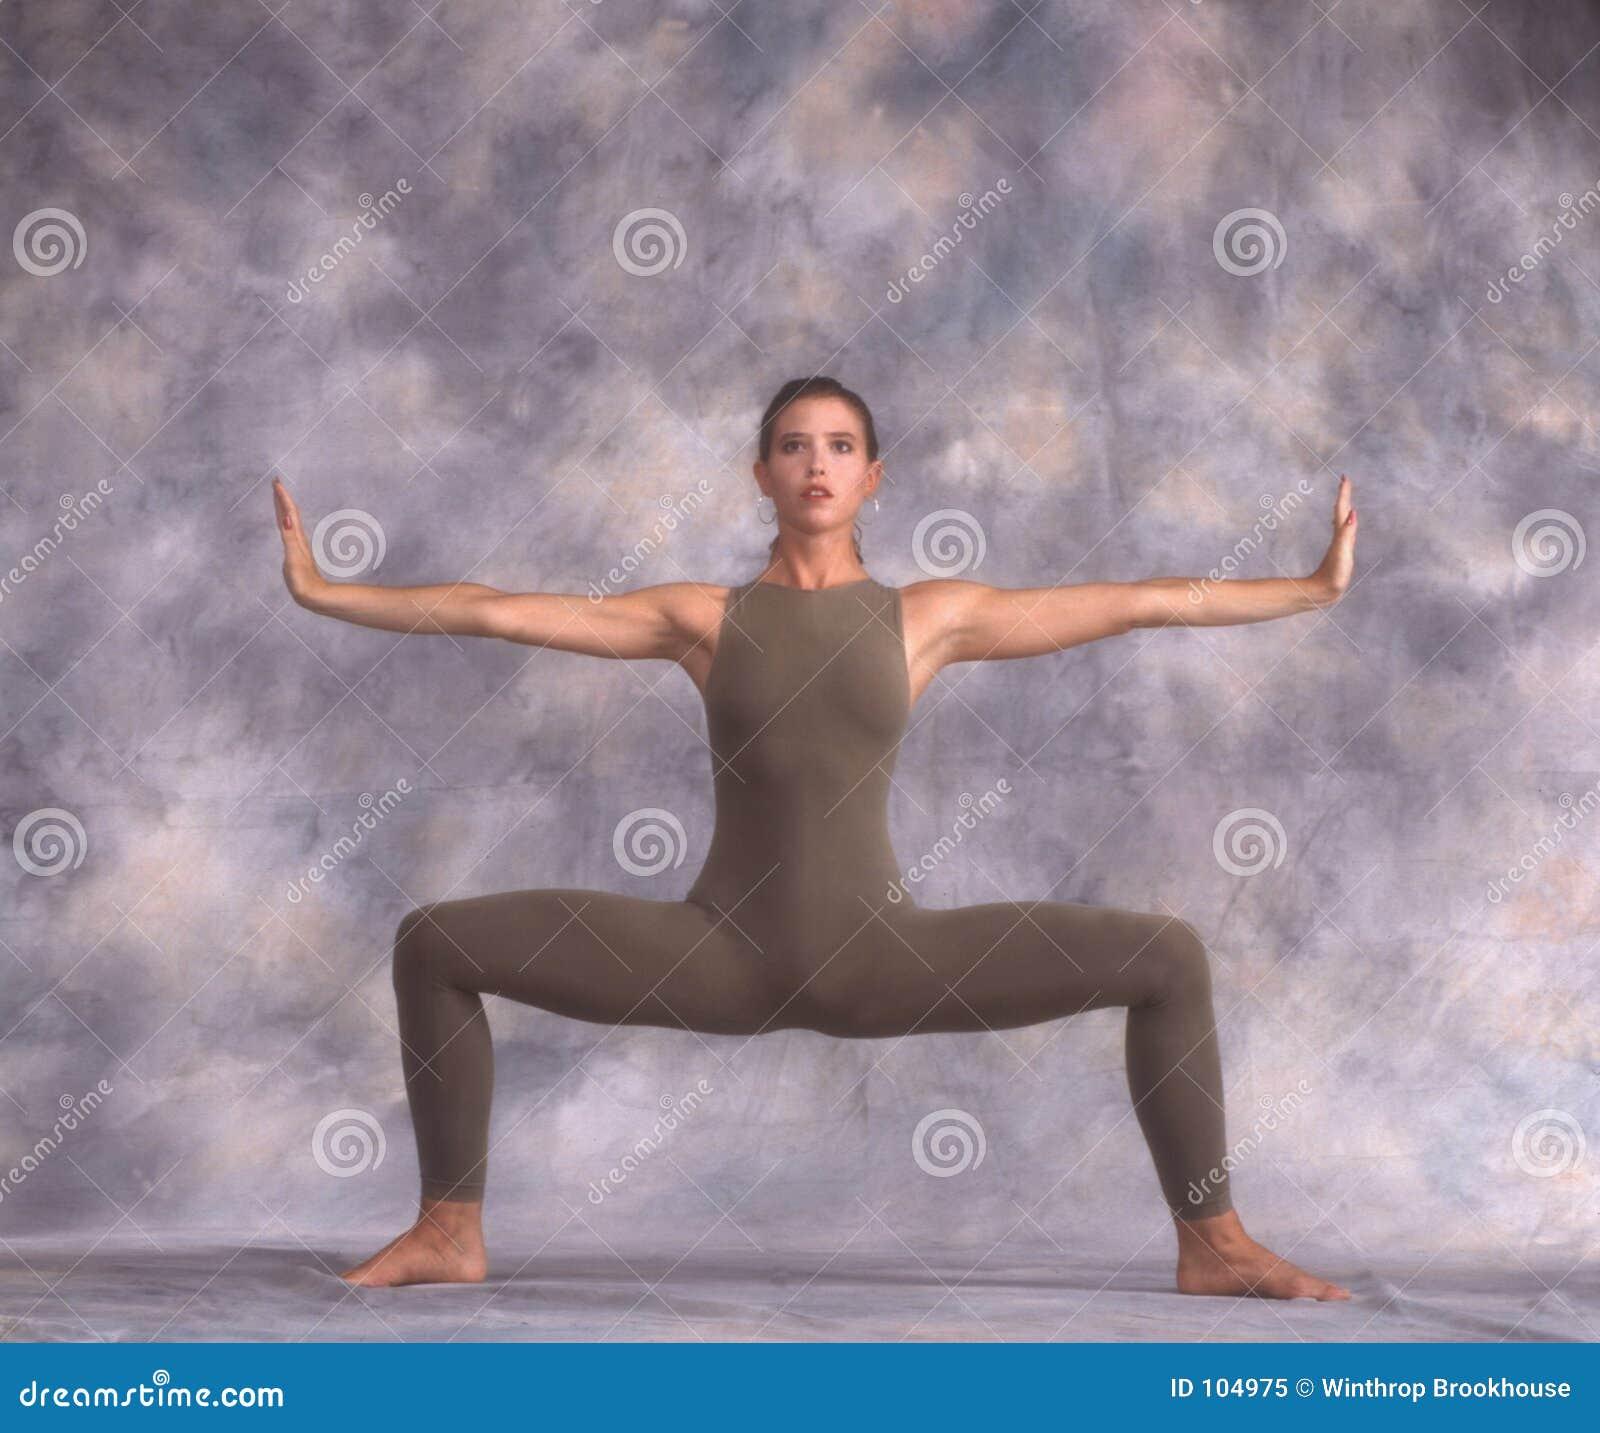 Dancer in a Y